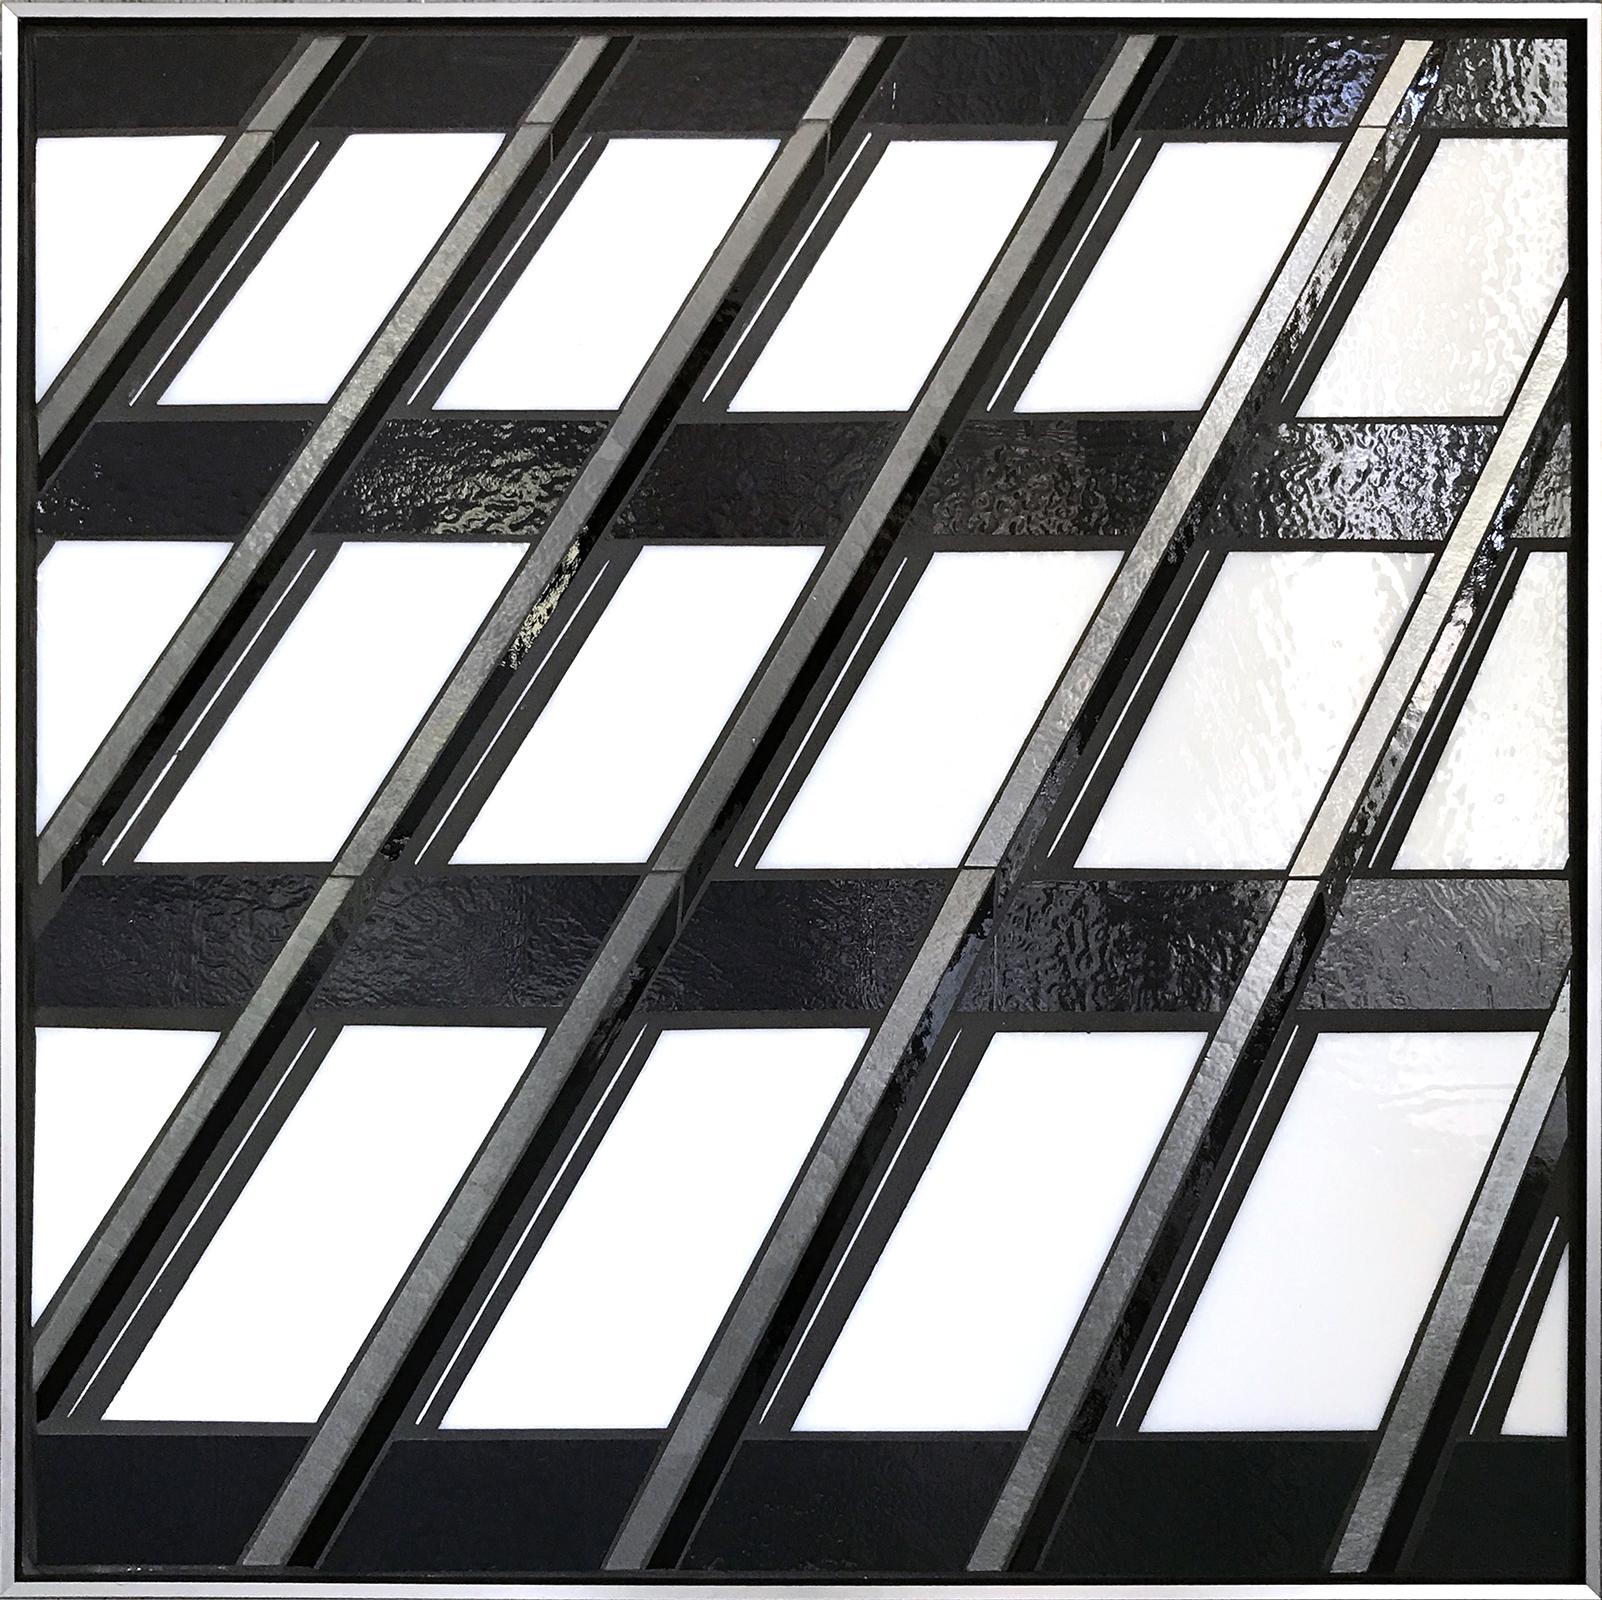 Reflect 1.18 white grid